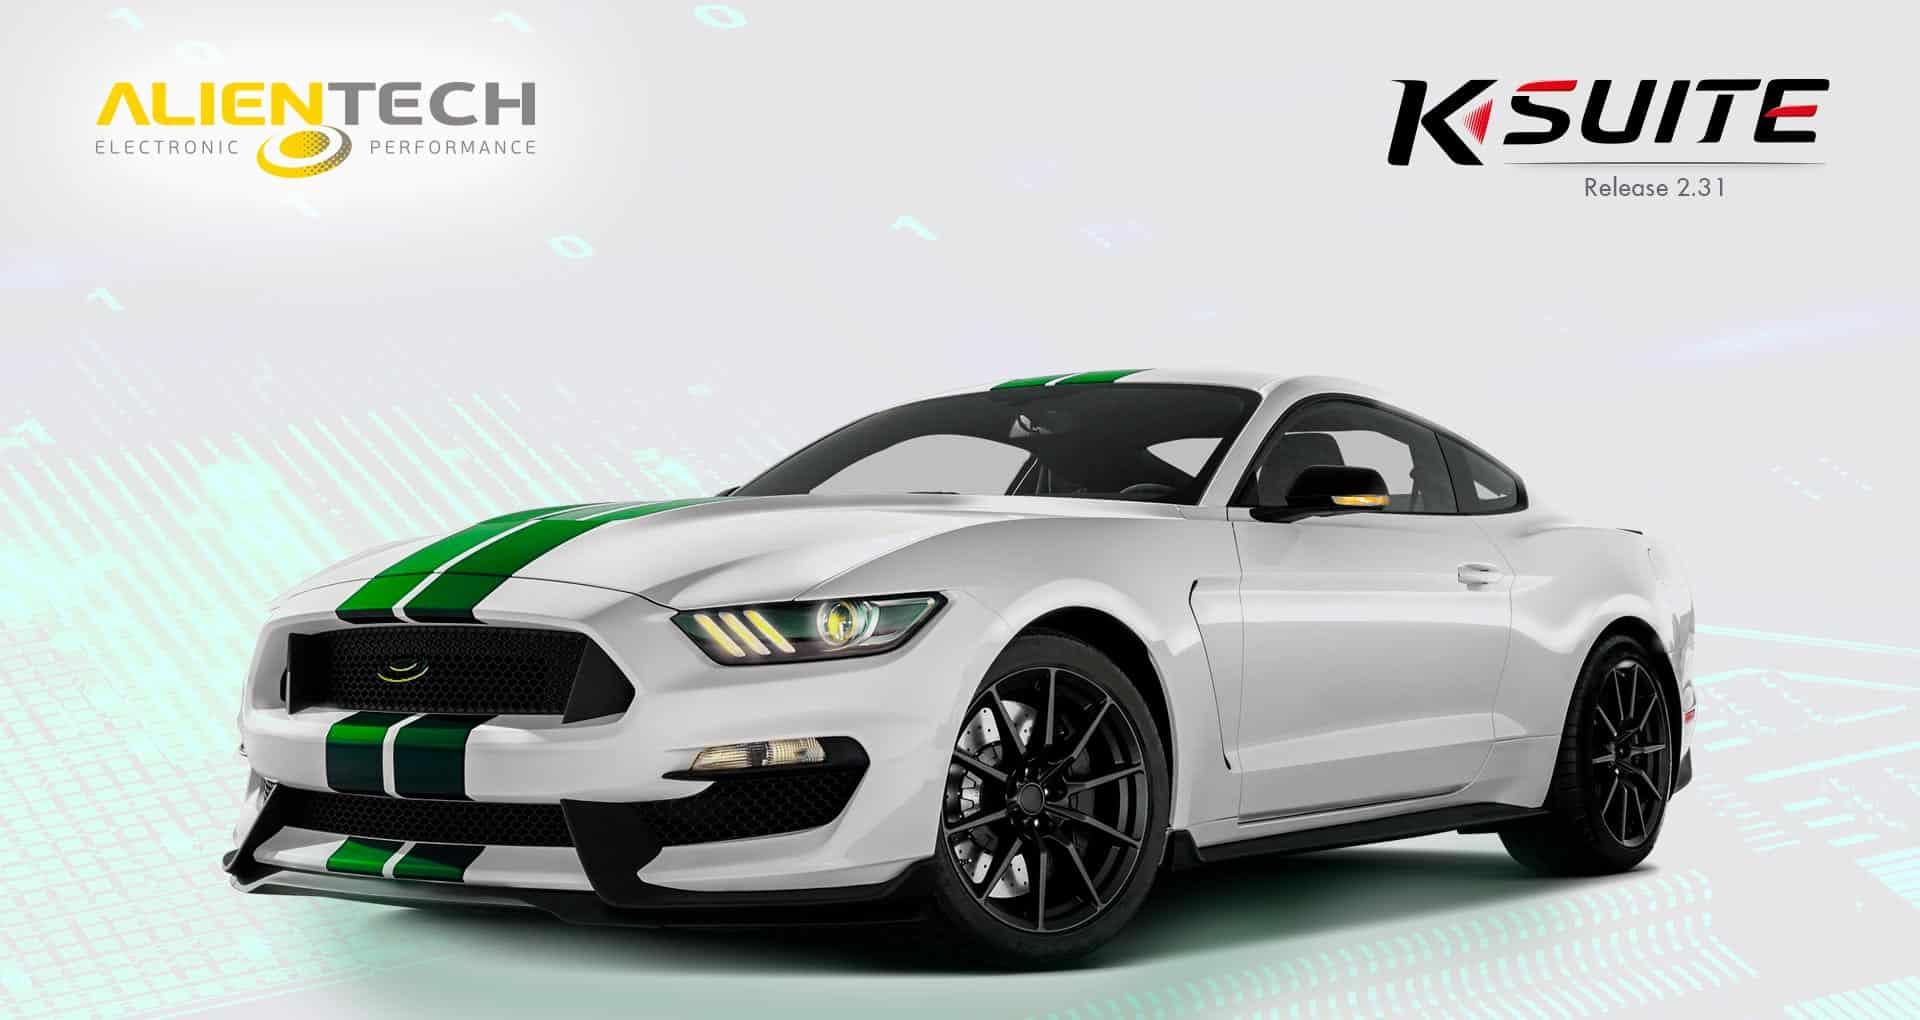 K Suite 2 31 Alientech News Blog